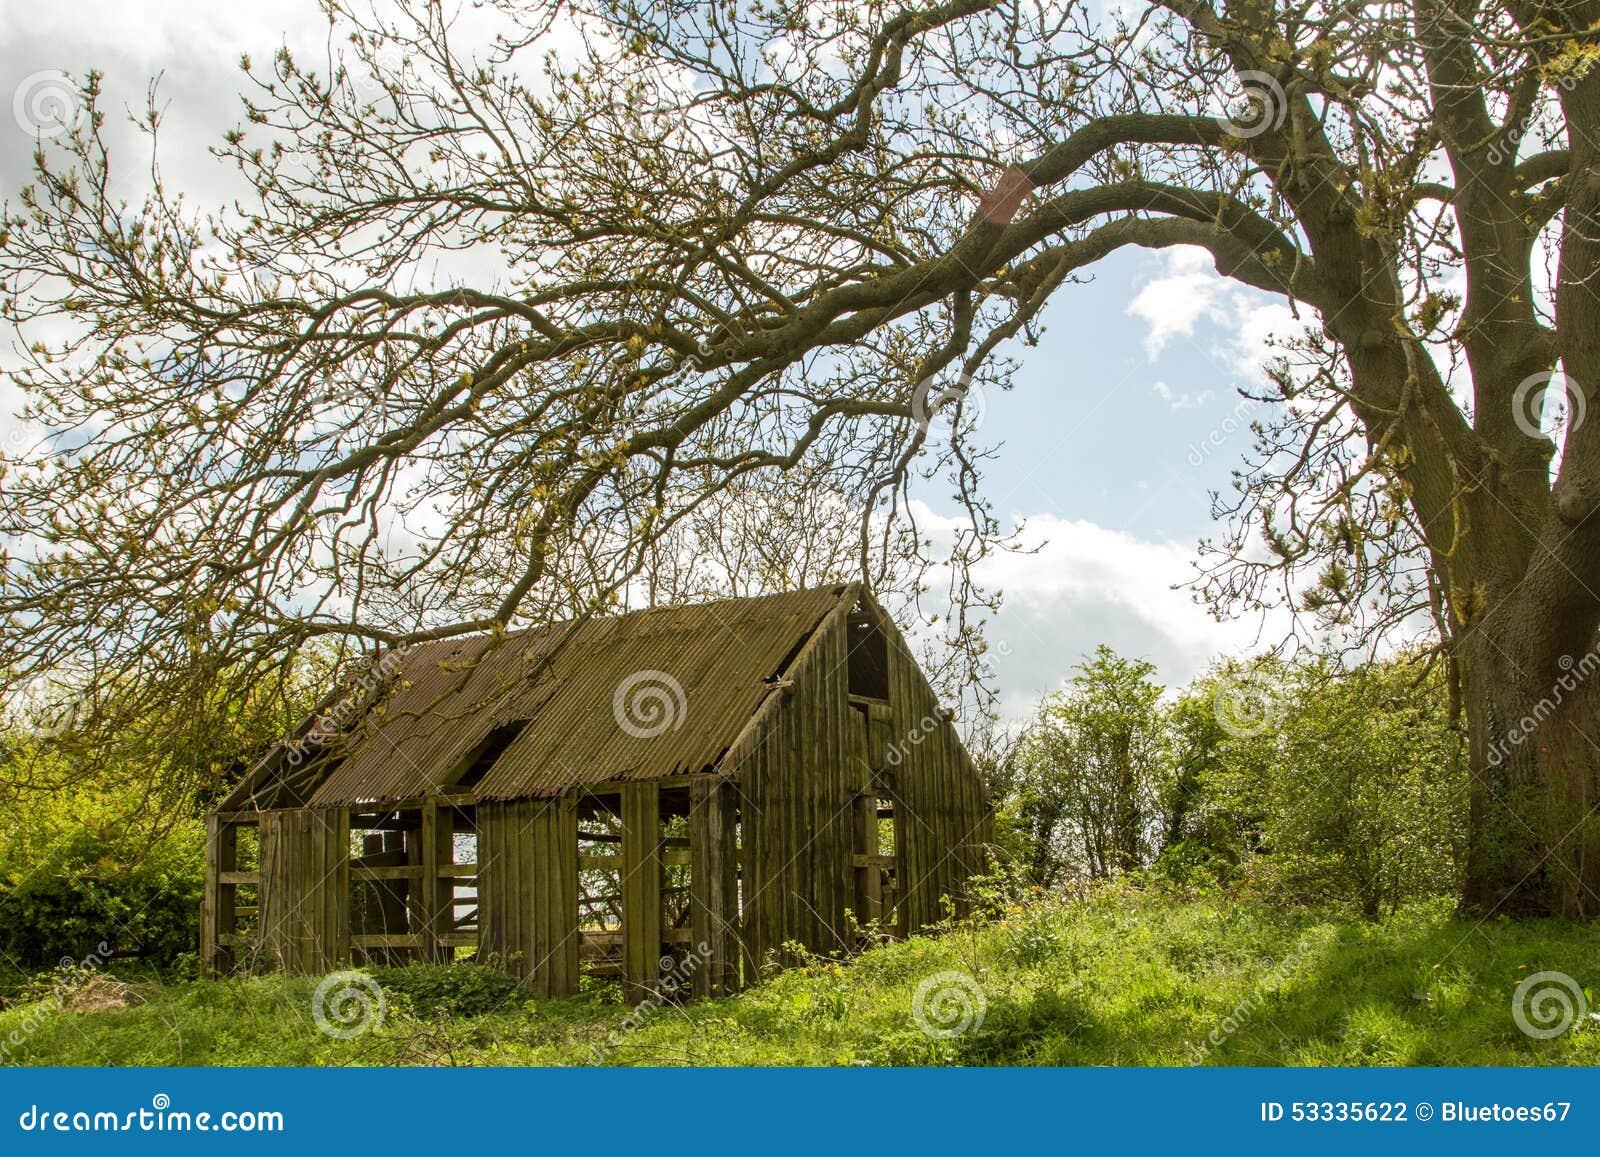 english countryside landscape old - photo #42